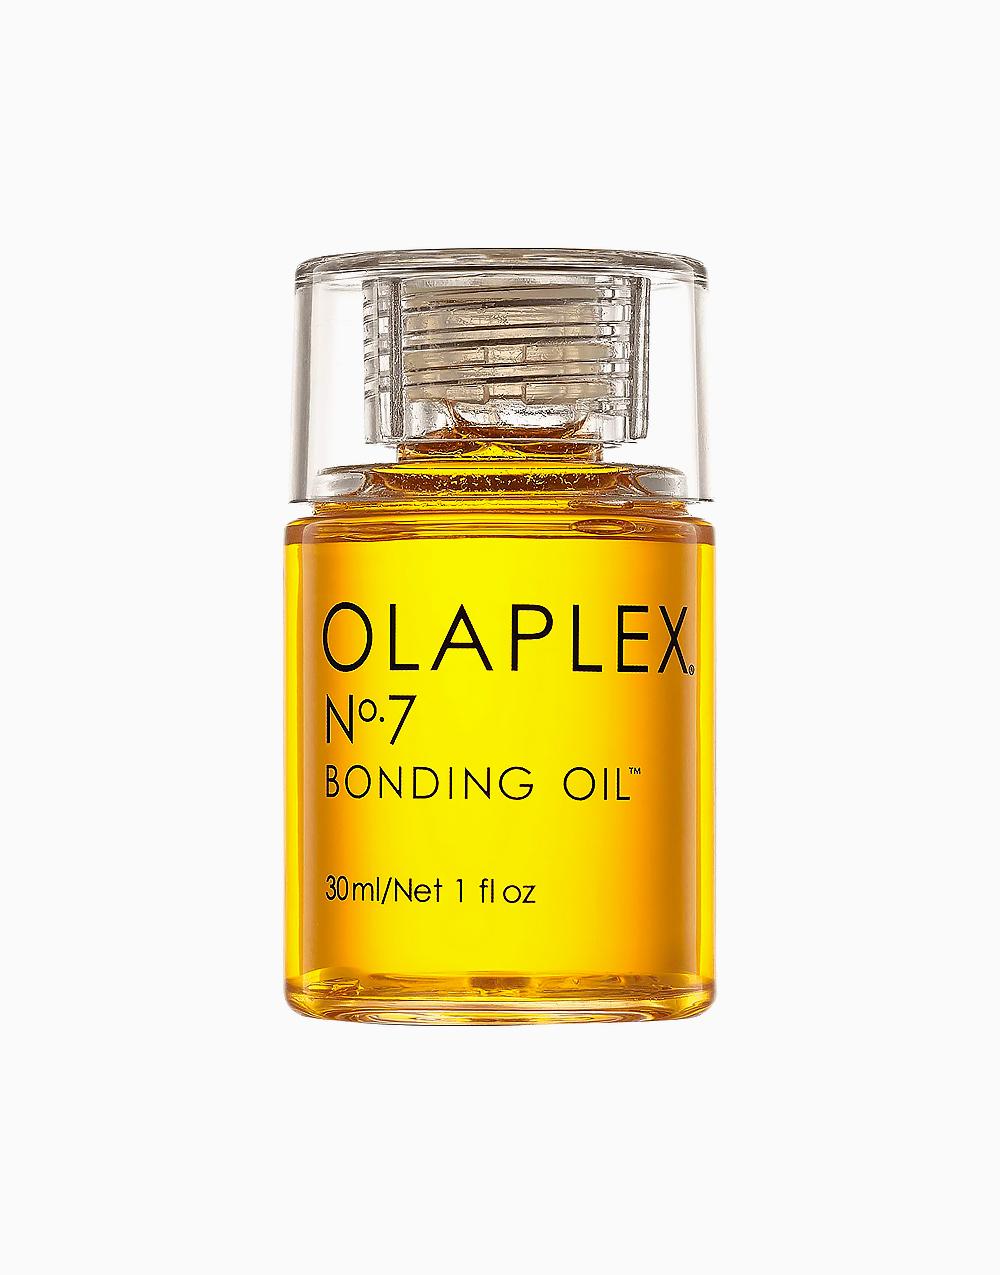 No. 7 Bonding Oil (30ml) by Olaplex